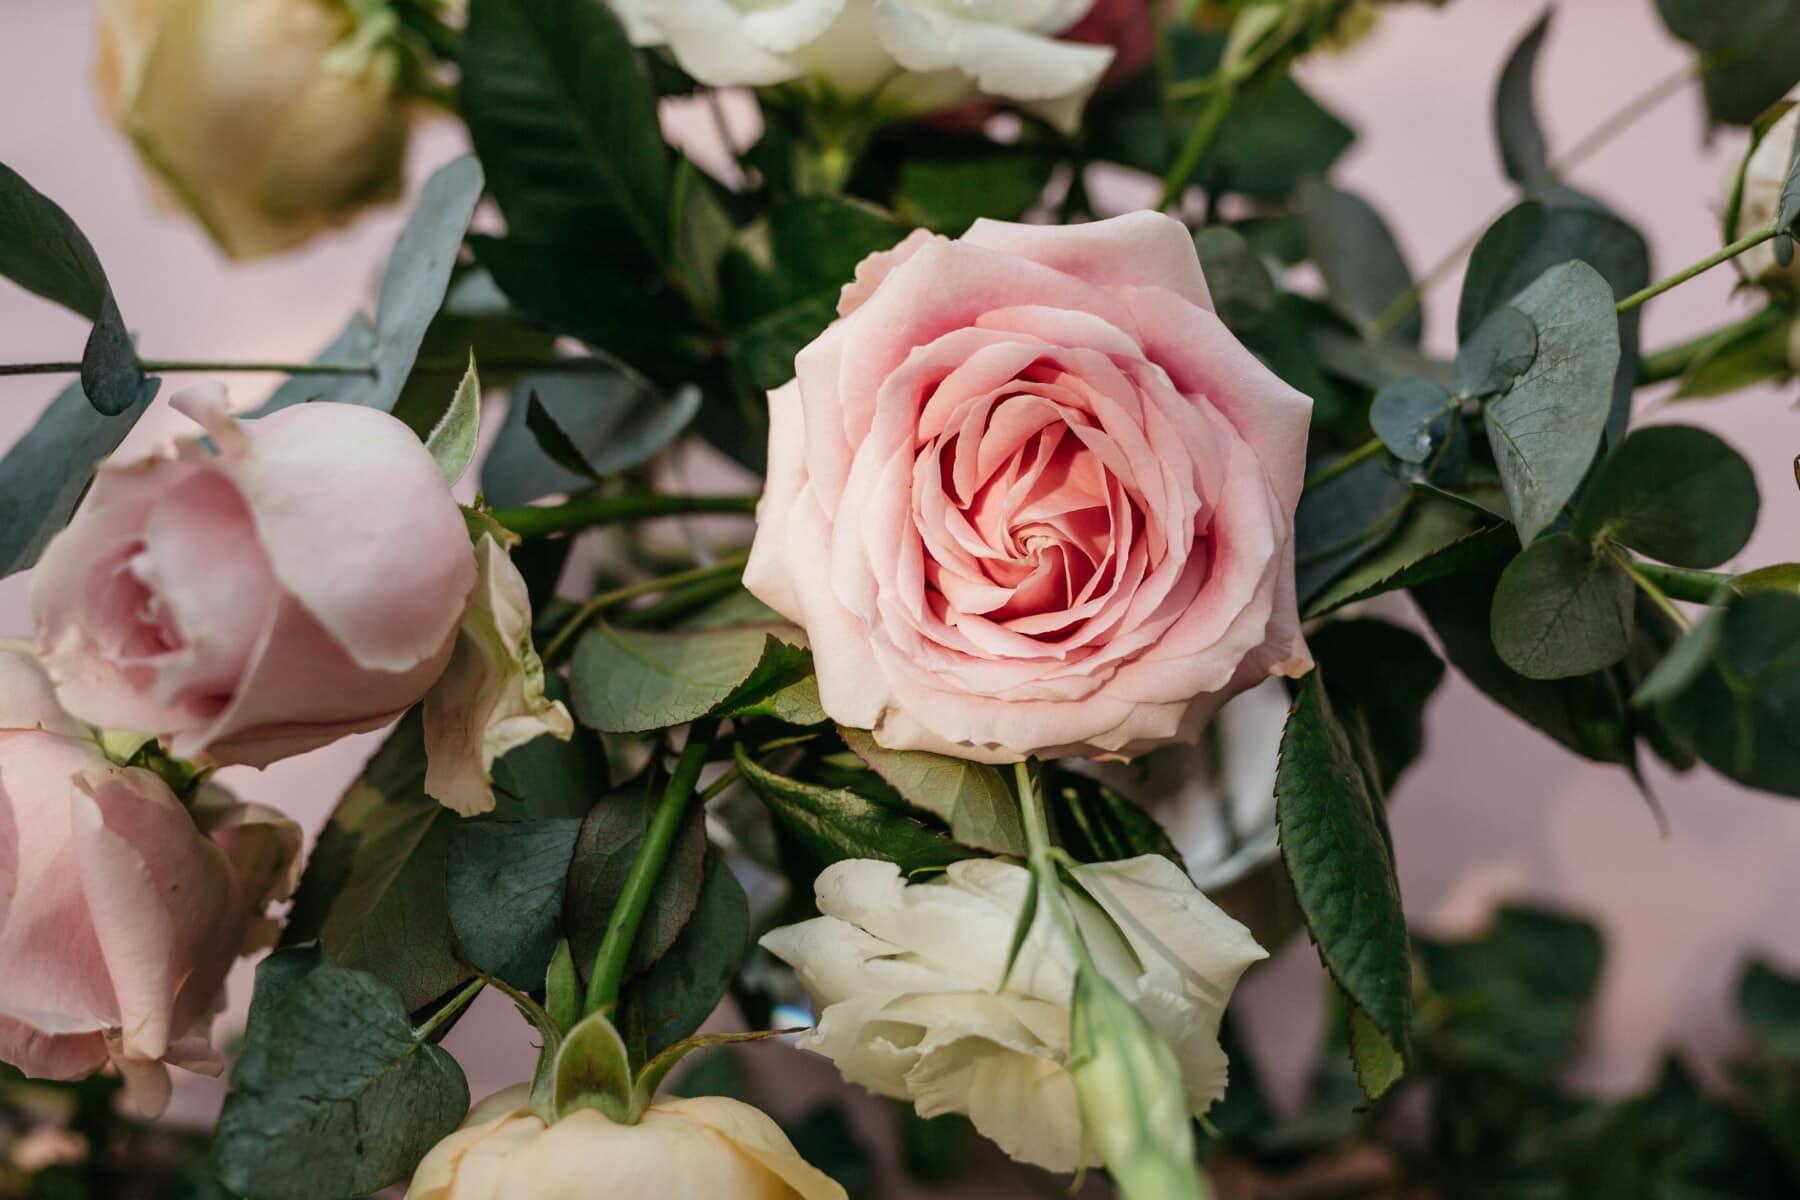 roses, pastel, pink, sunlight, close-up, petals, nature, flower, leaf, plant